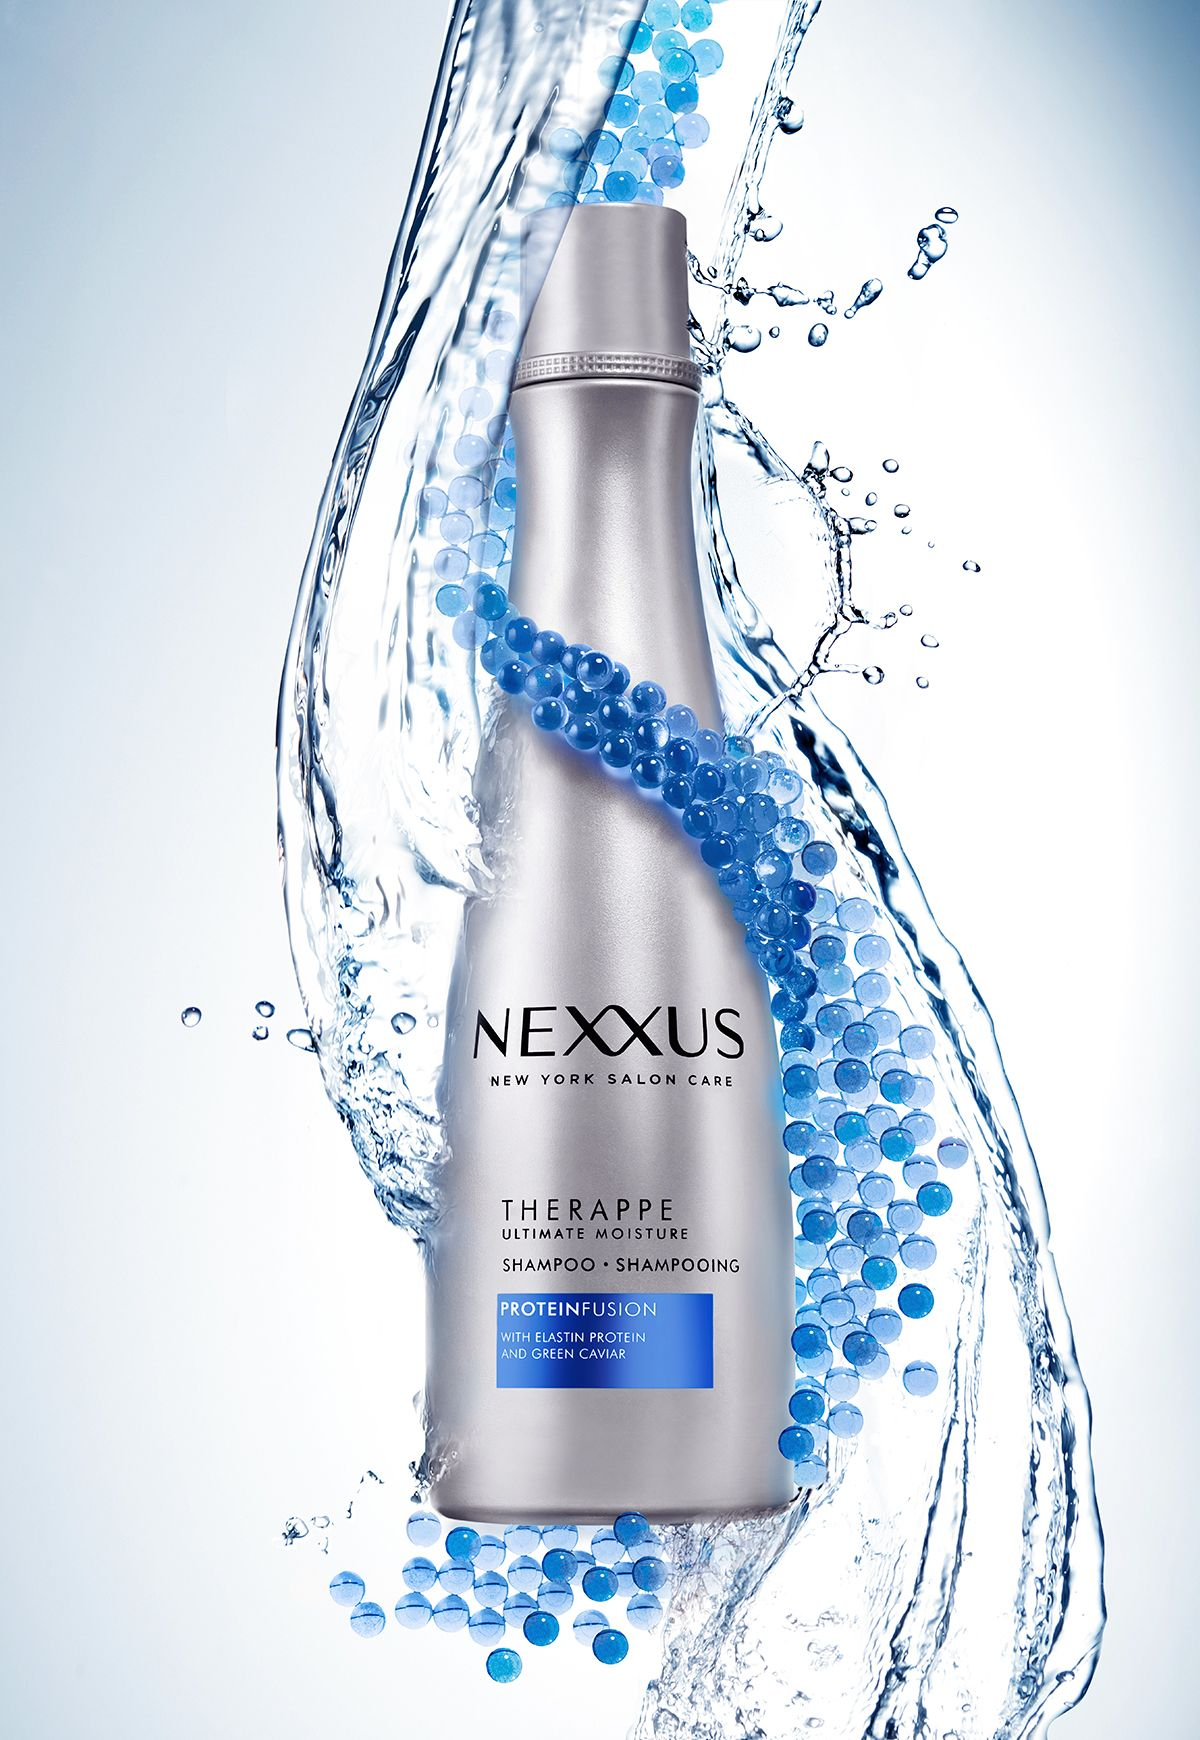 61384_Nexxus_Therappe_Shampoo_Ingredient_1410E.jpg